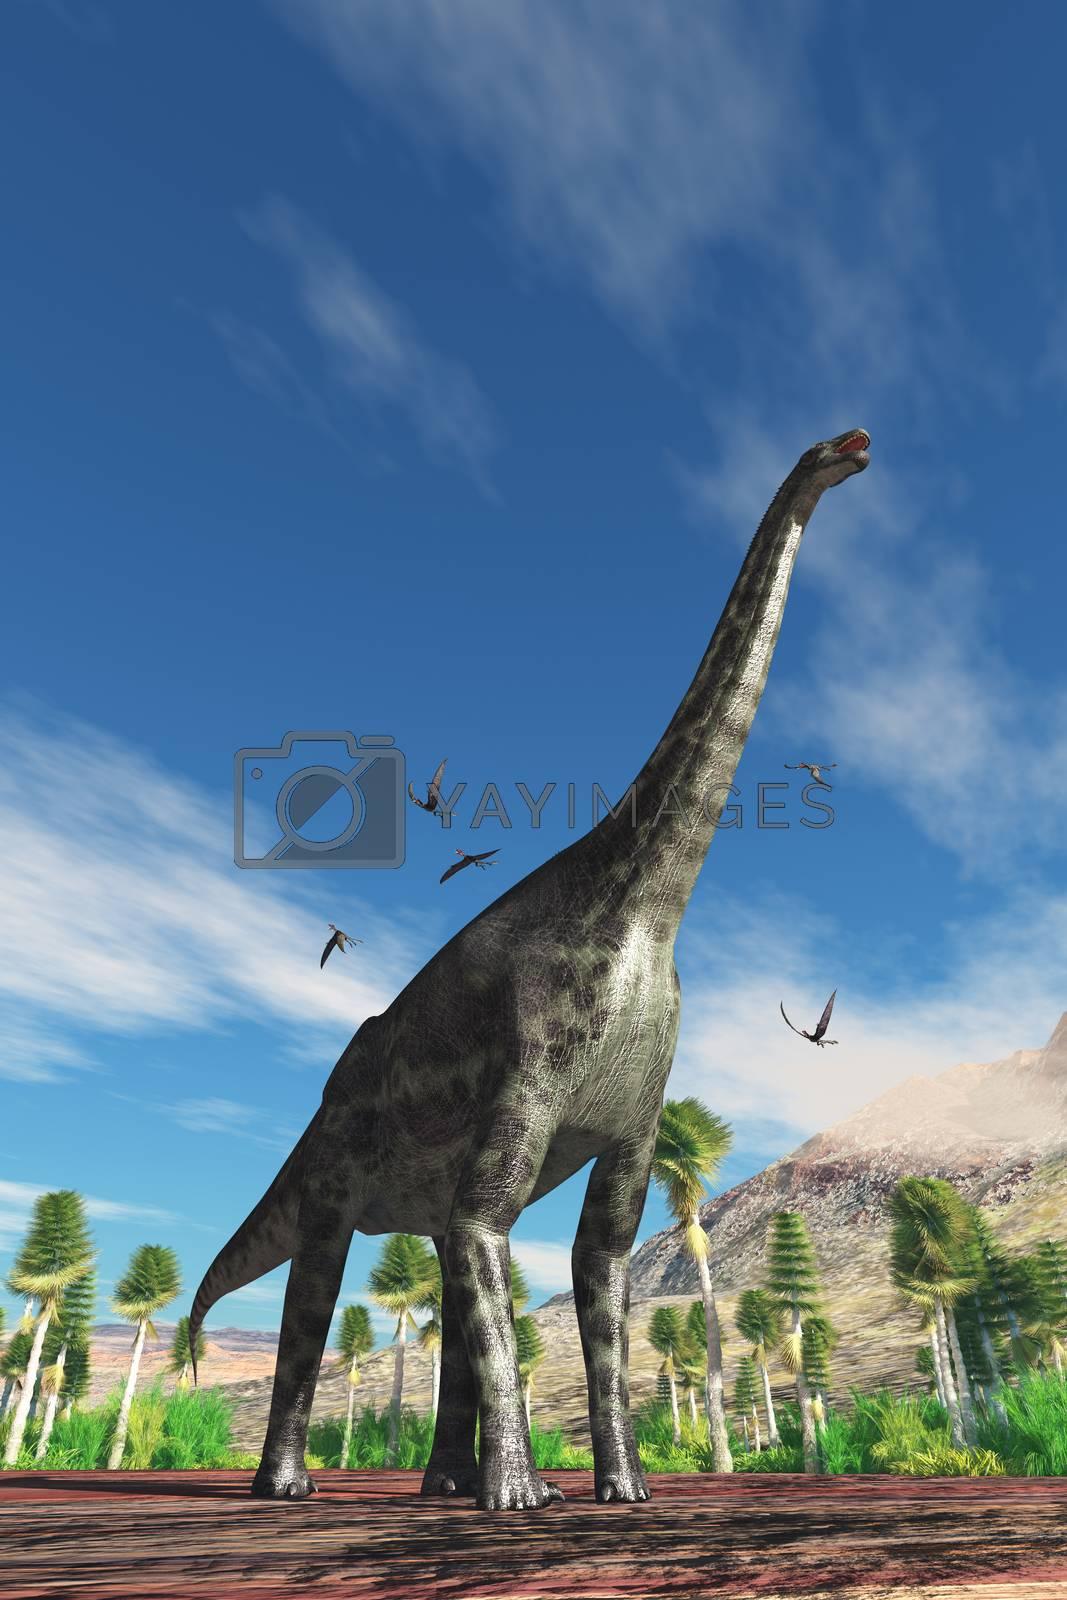 Cetiosaurus herbivorous dinosaur is surrounded by Dorygnathus Pterosaur birds during the Jurassic Period.